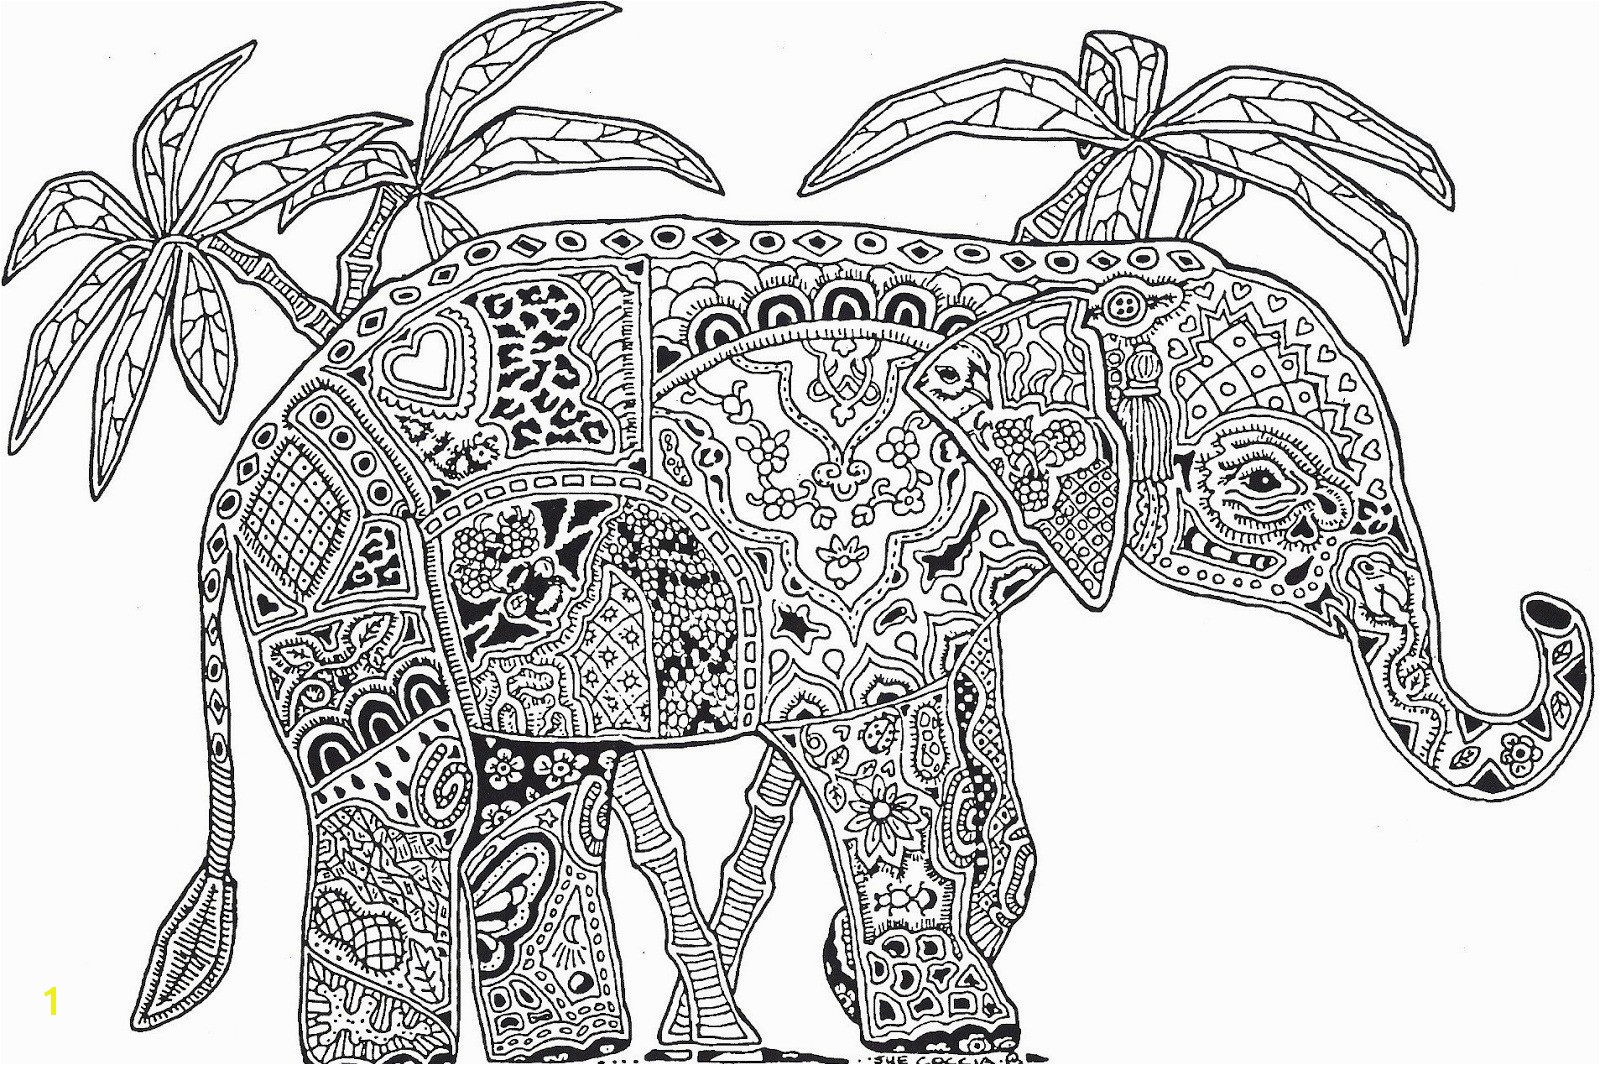 Elephant Mandala Coloring Pages Awesome Adult Coloring Pages Pdfelephant Mandala Coloring Pages